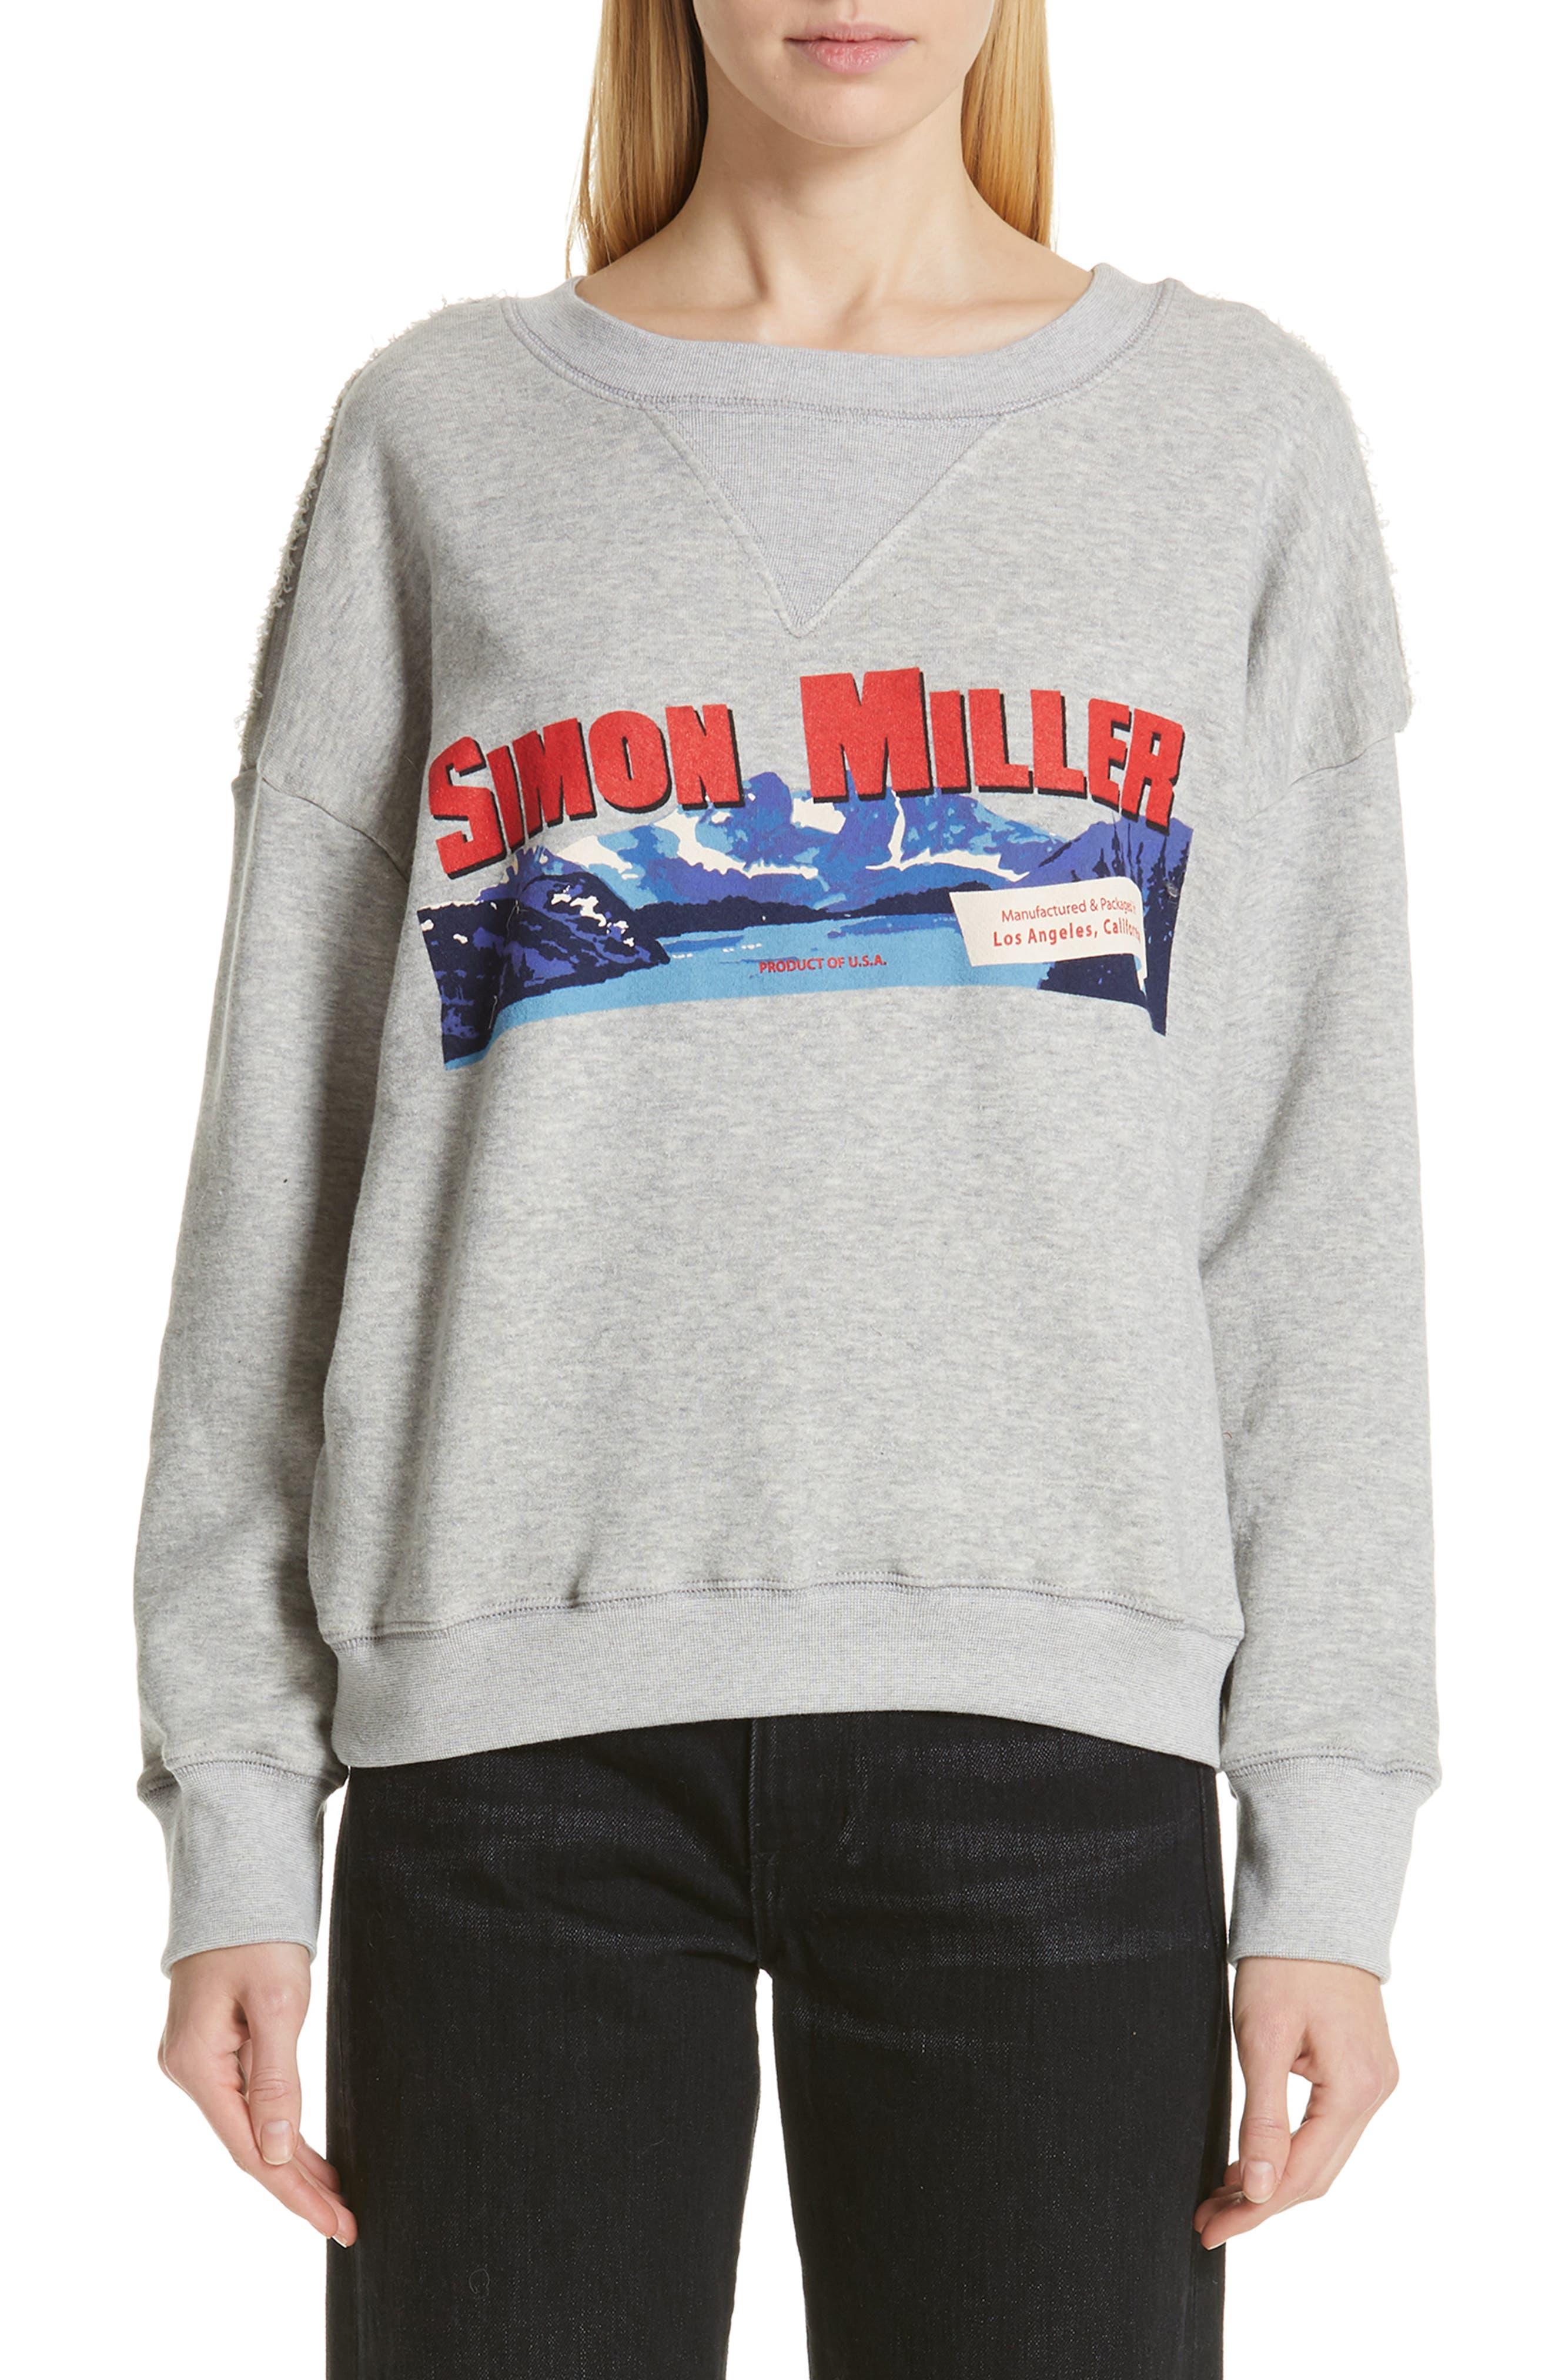 Simon Miller West Sweatshirt, Grey